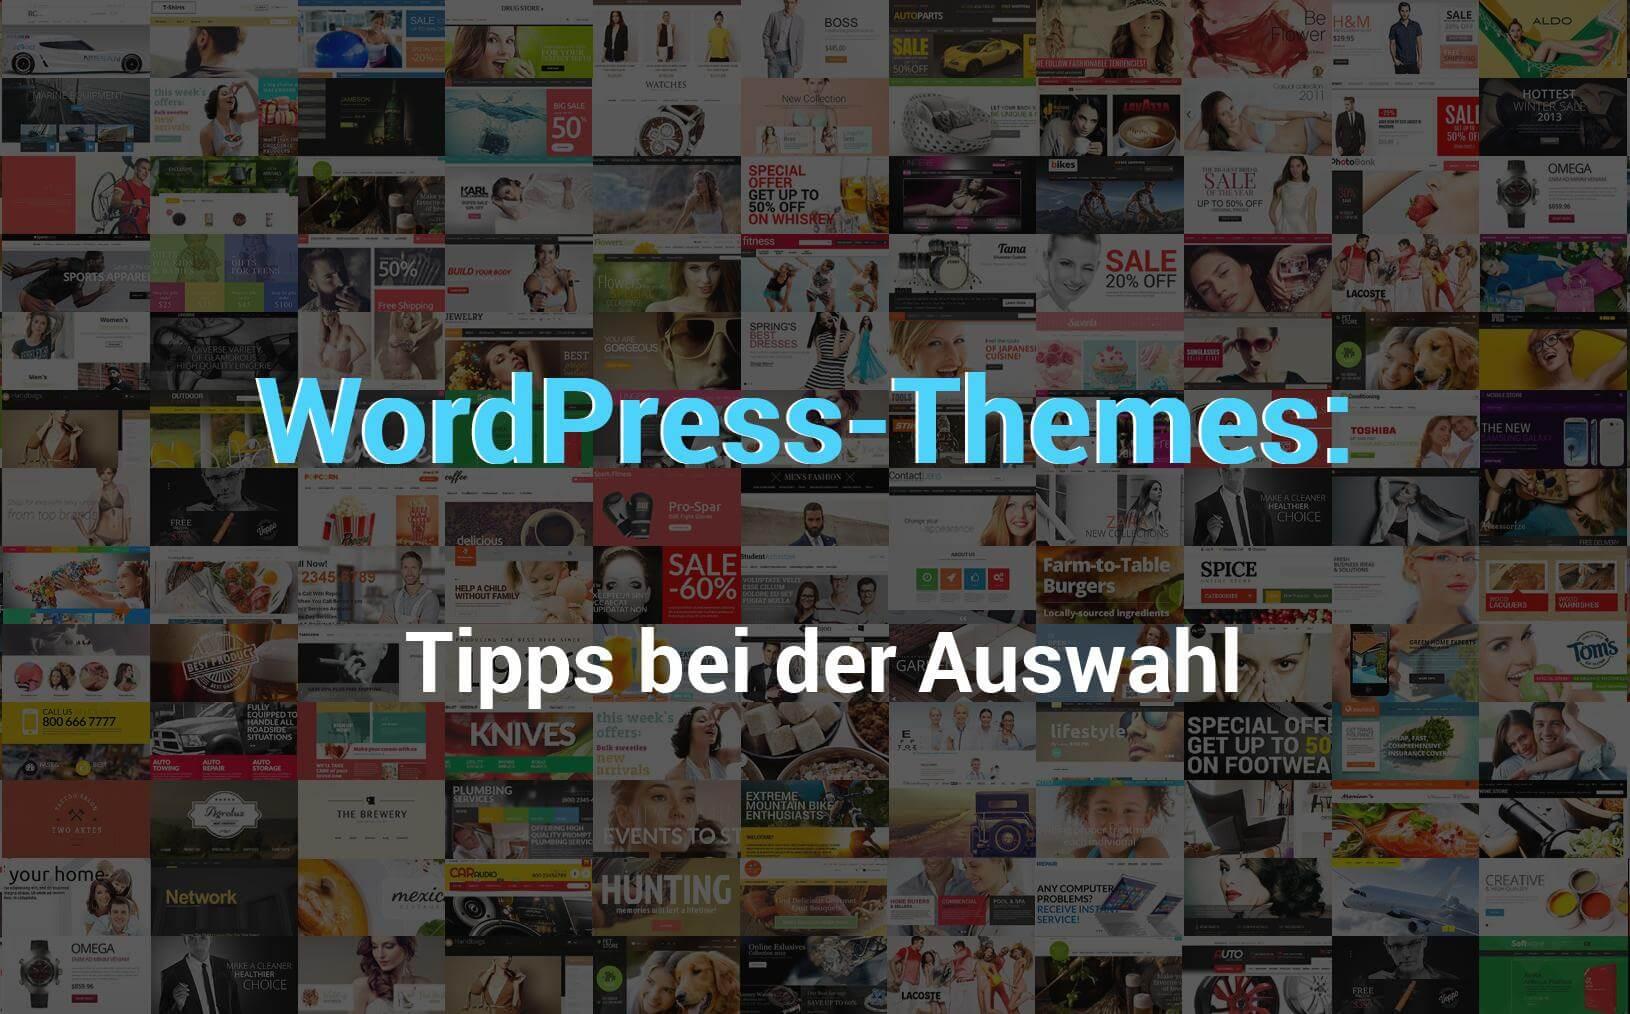 templatemonster-wordpress-themes-tipps-bei-der-auswahl-internetblogger-de